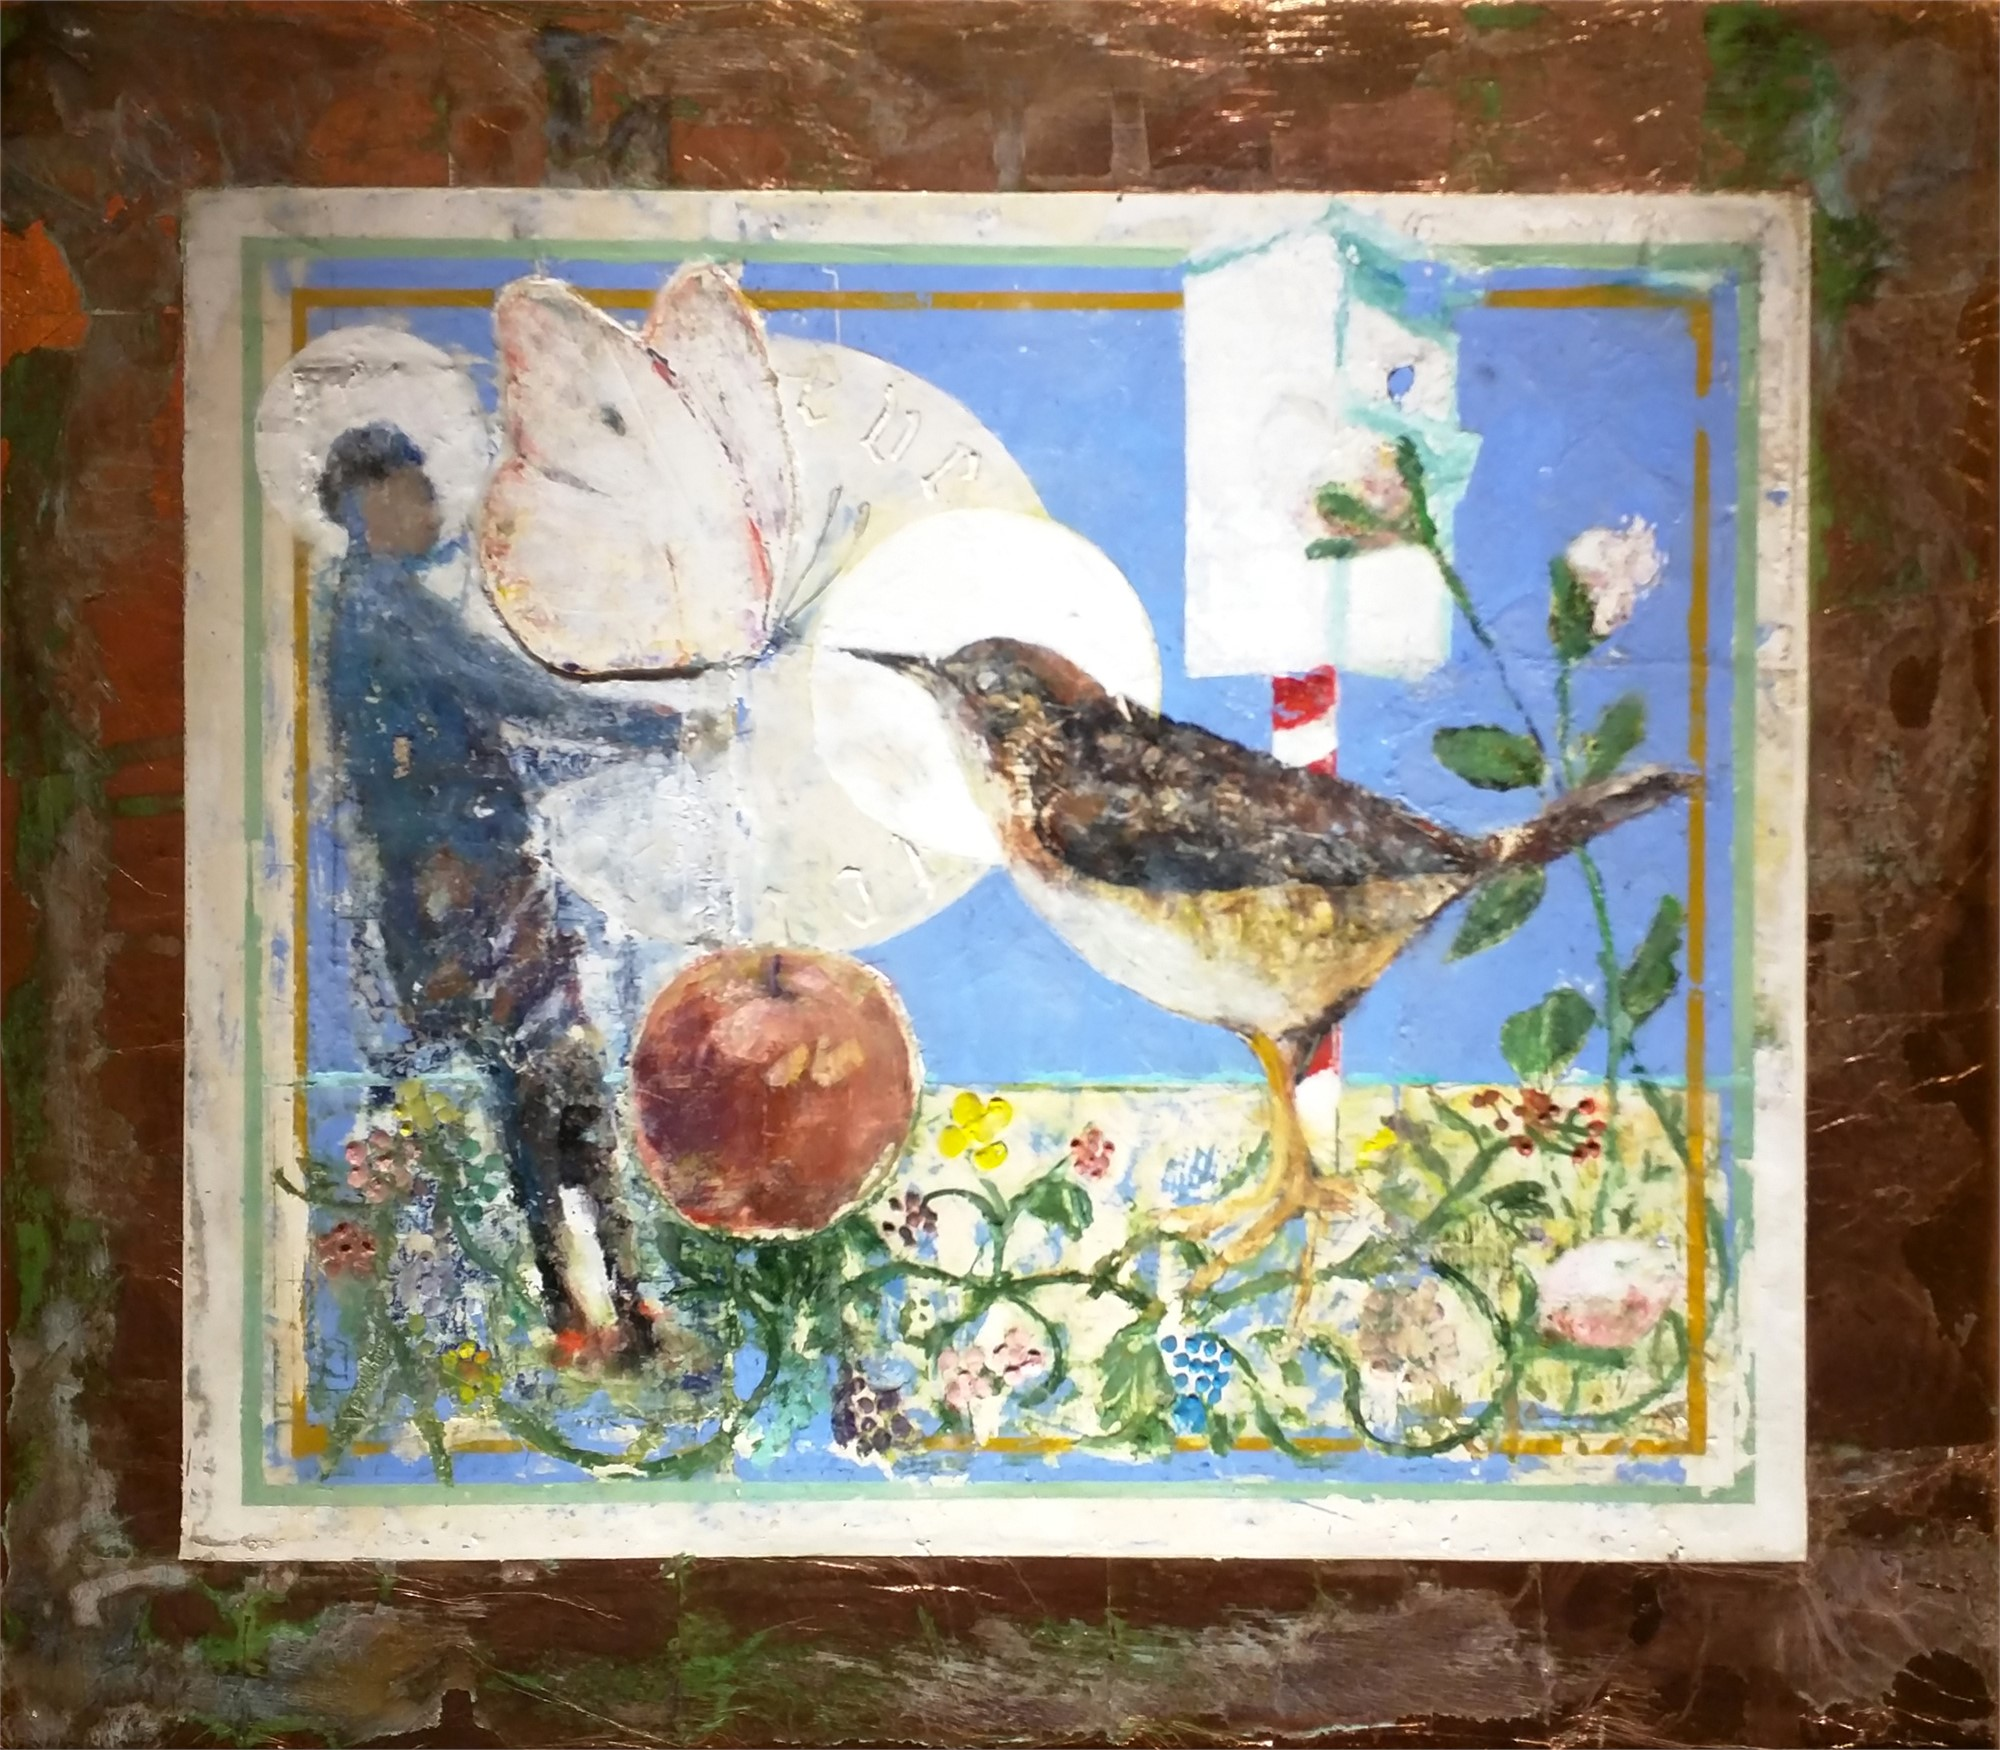 Still Life for Bird Temple #1 by Mark Gaskin